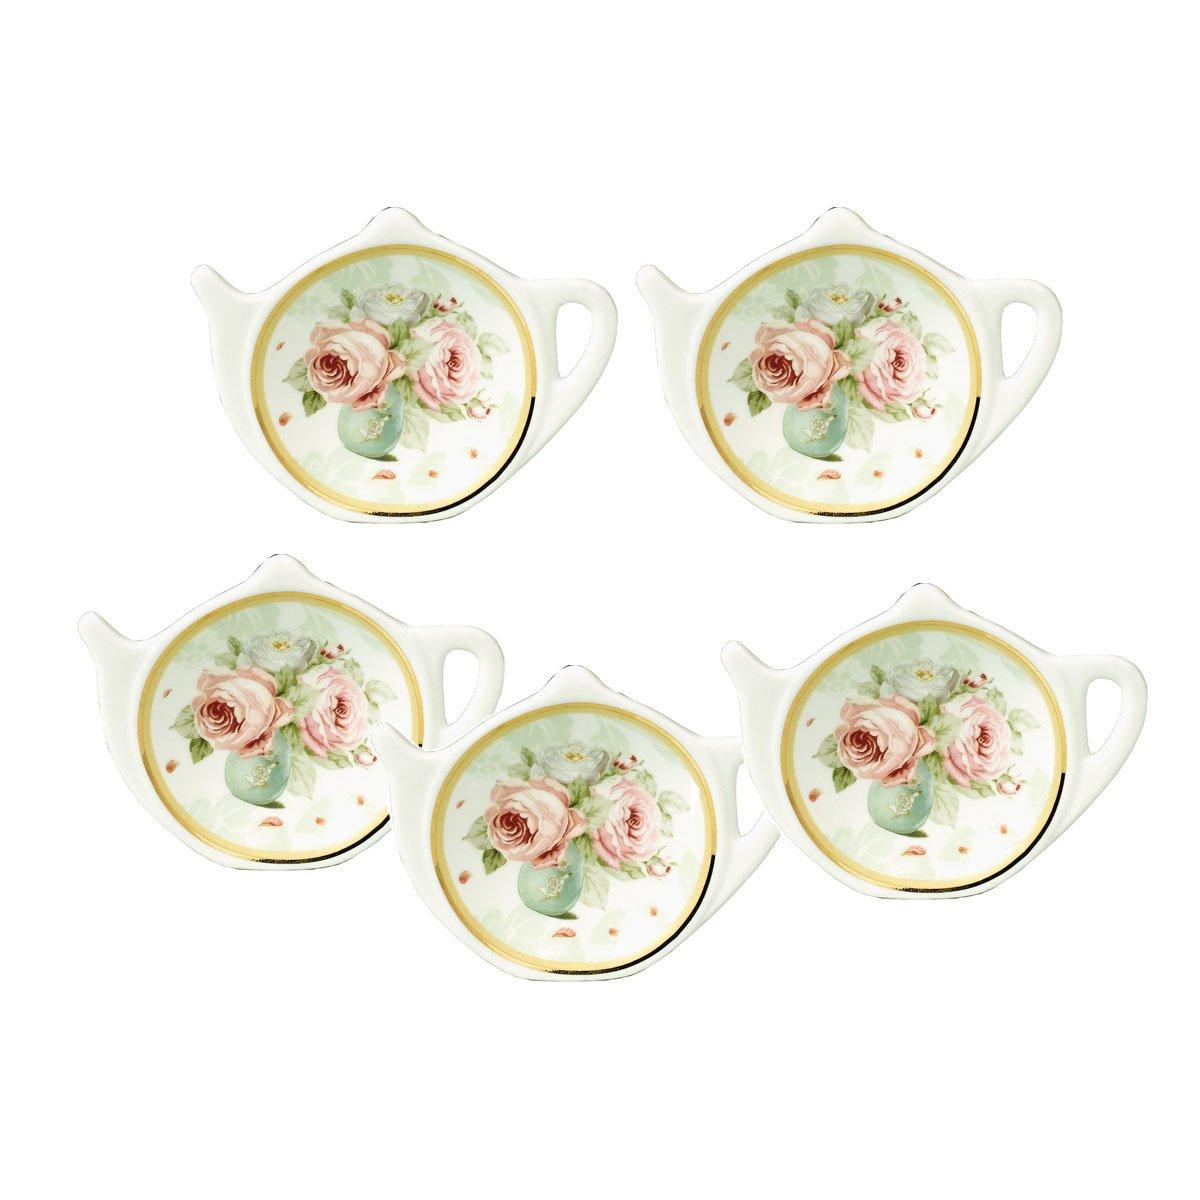 White Porcelain Ceramic with Flower Trim Gold Rim Teapot-Shaped Tea Bag Holder Tea Bag Coasters, Spoon Rests; Classic Tea Saucer Seasoning Dish Set by Linlins (Image #1)